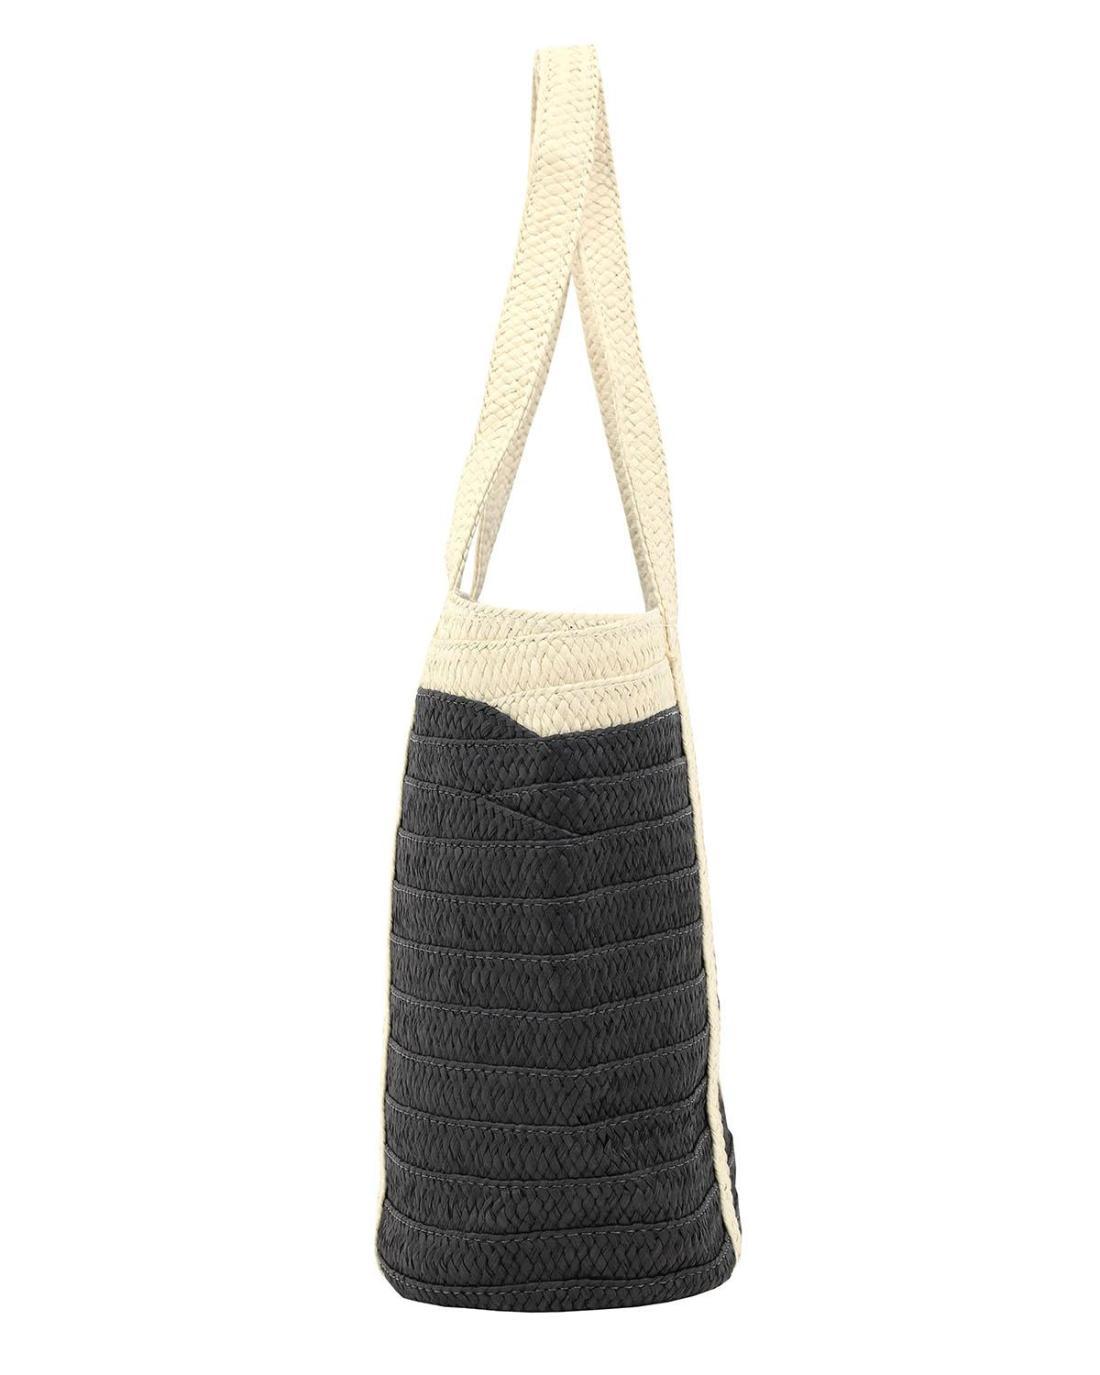 Paper straw black beach bag